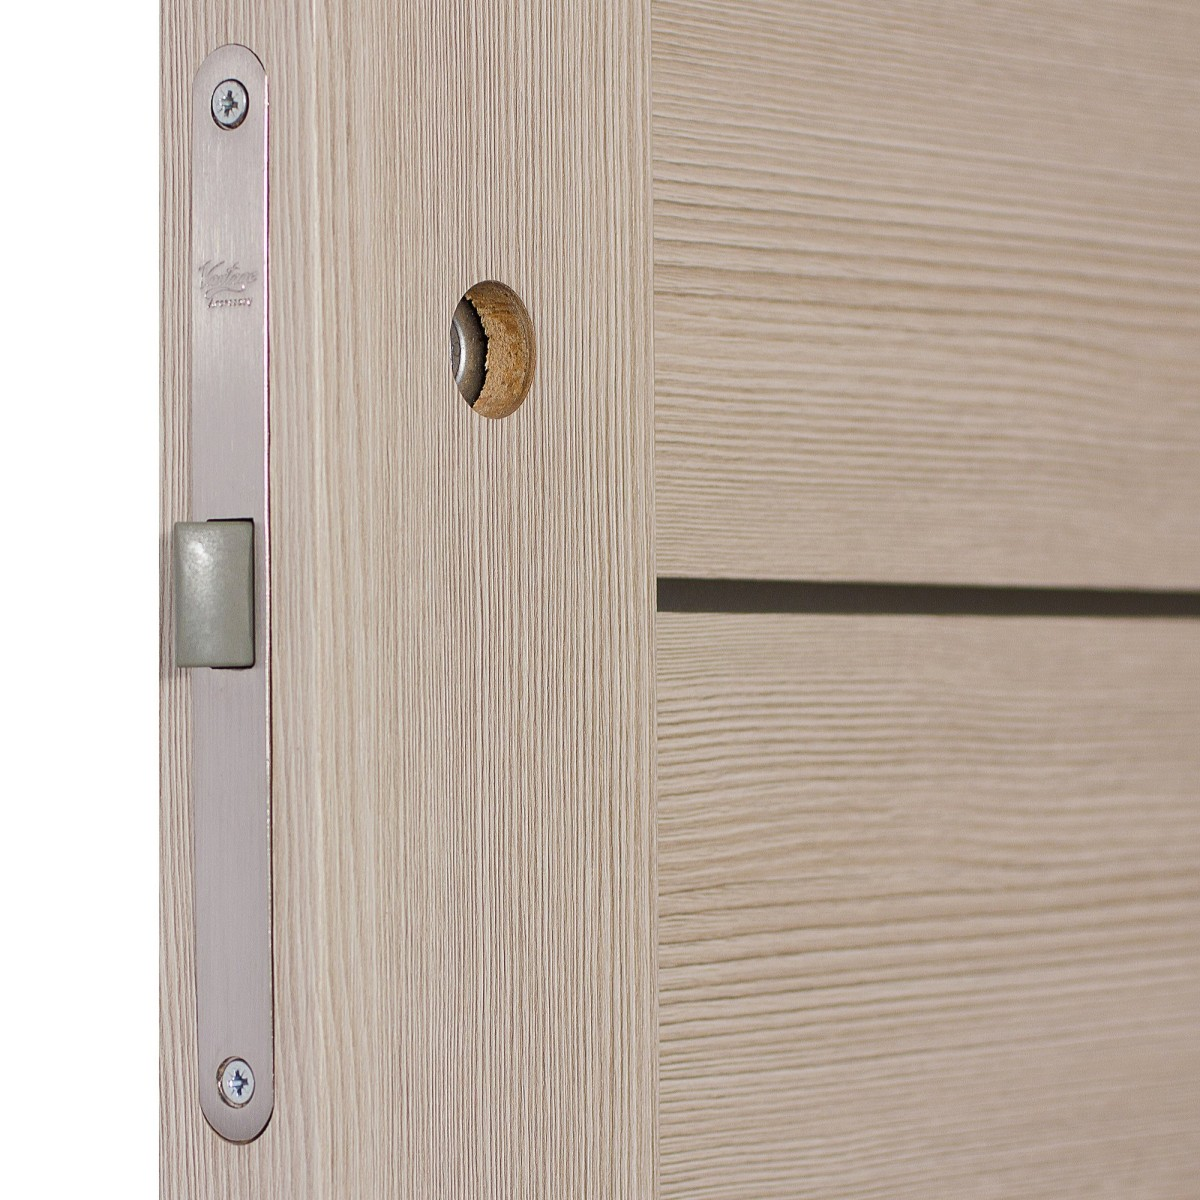 Дверь Межкомнатная Глухая Ницца 90x200 Пвх Цвет Кремовый С Фурнитурой